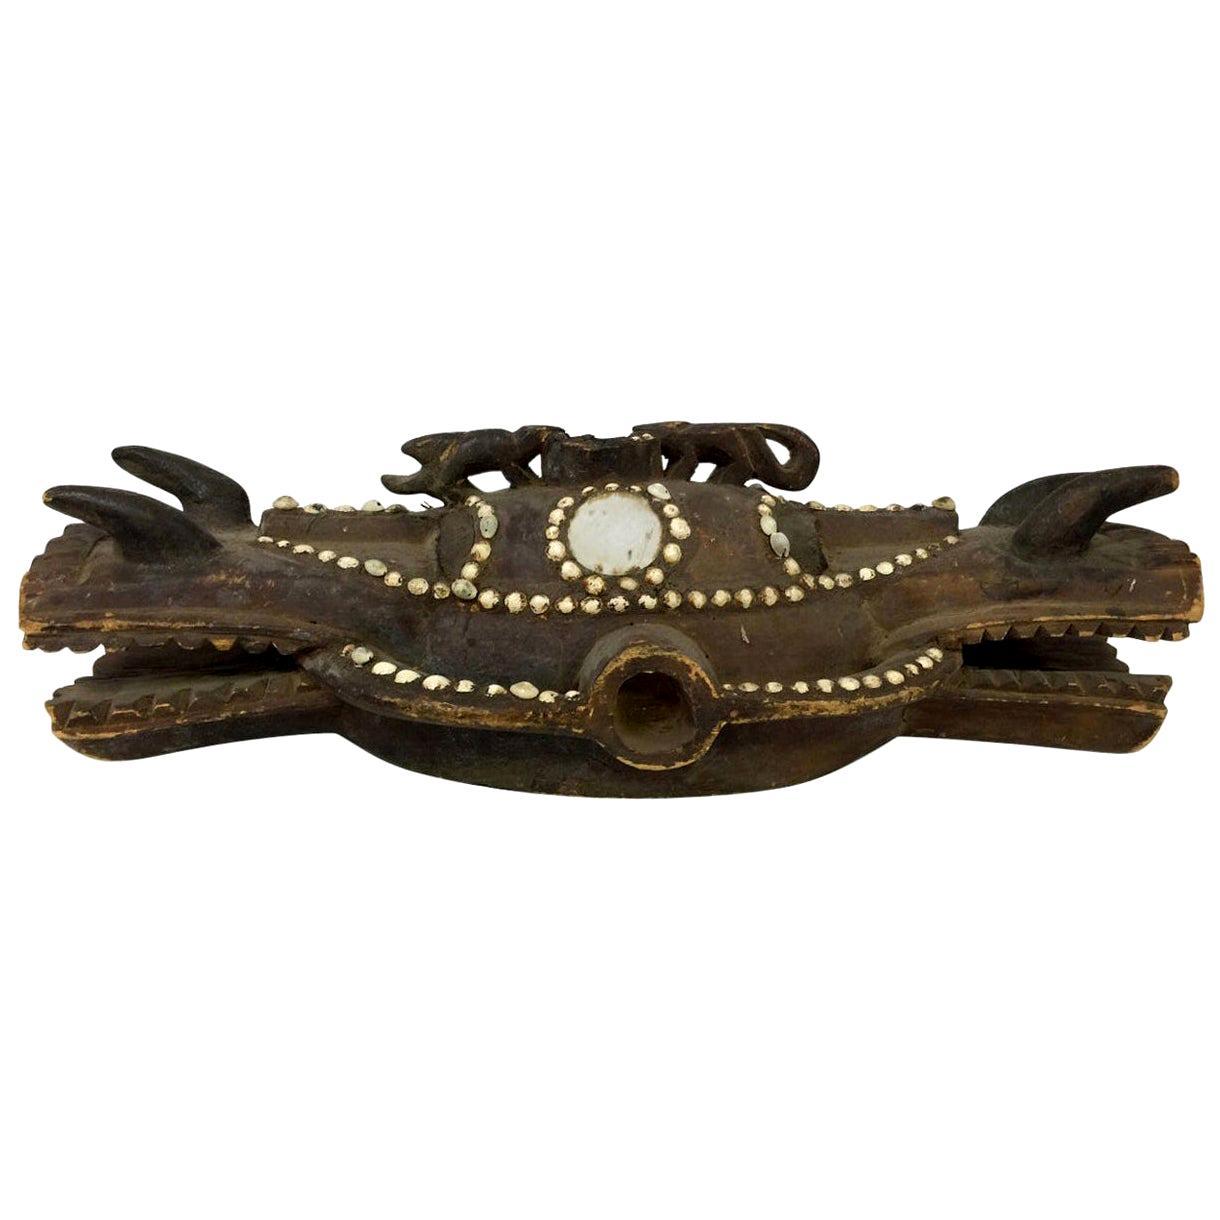 African Senufo Large Heavy Janus Firespitter Helmet Mask Wanyugo